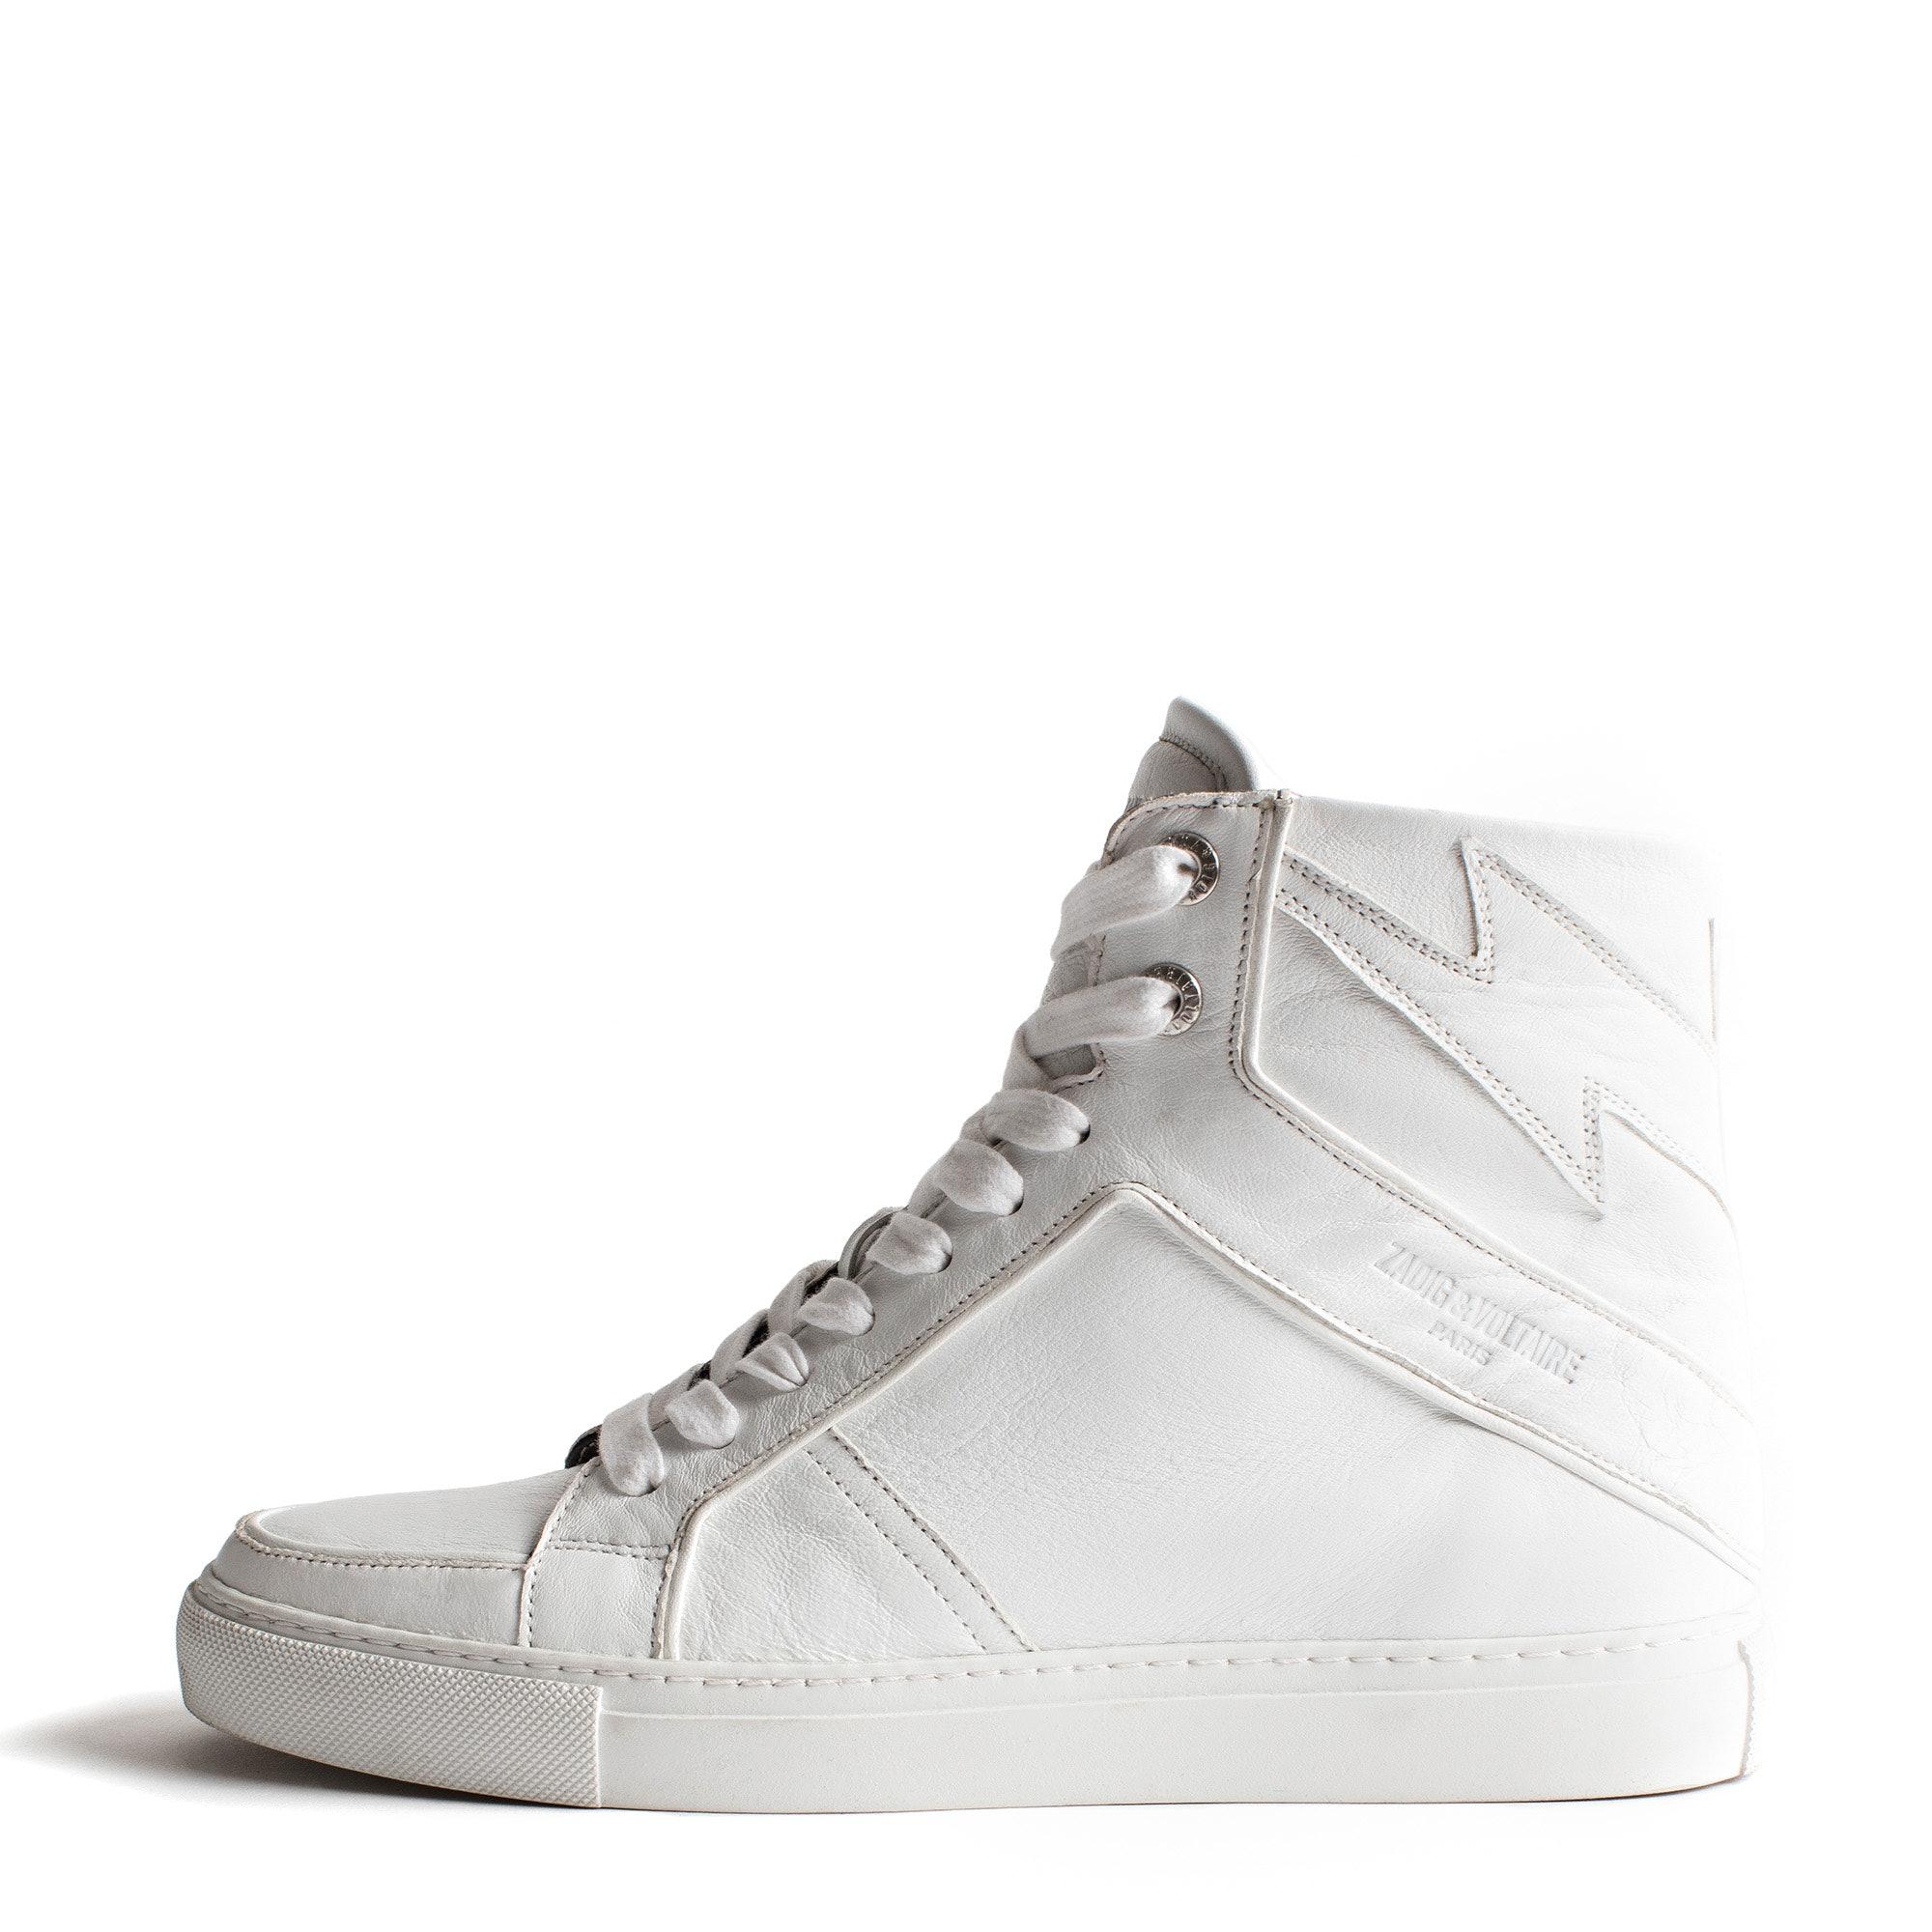 Sneakers Zv1747 High Flash - Zadig & Voltaire - Modalova